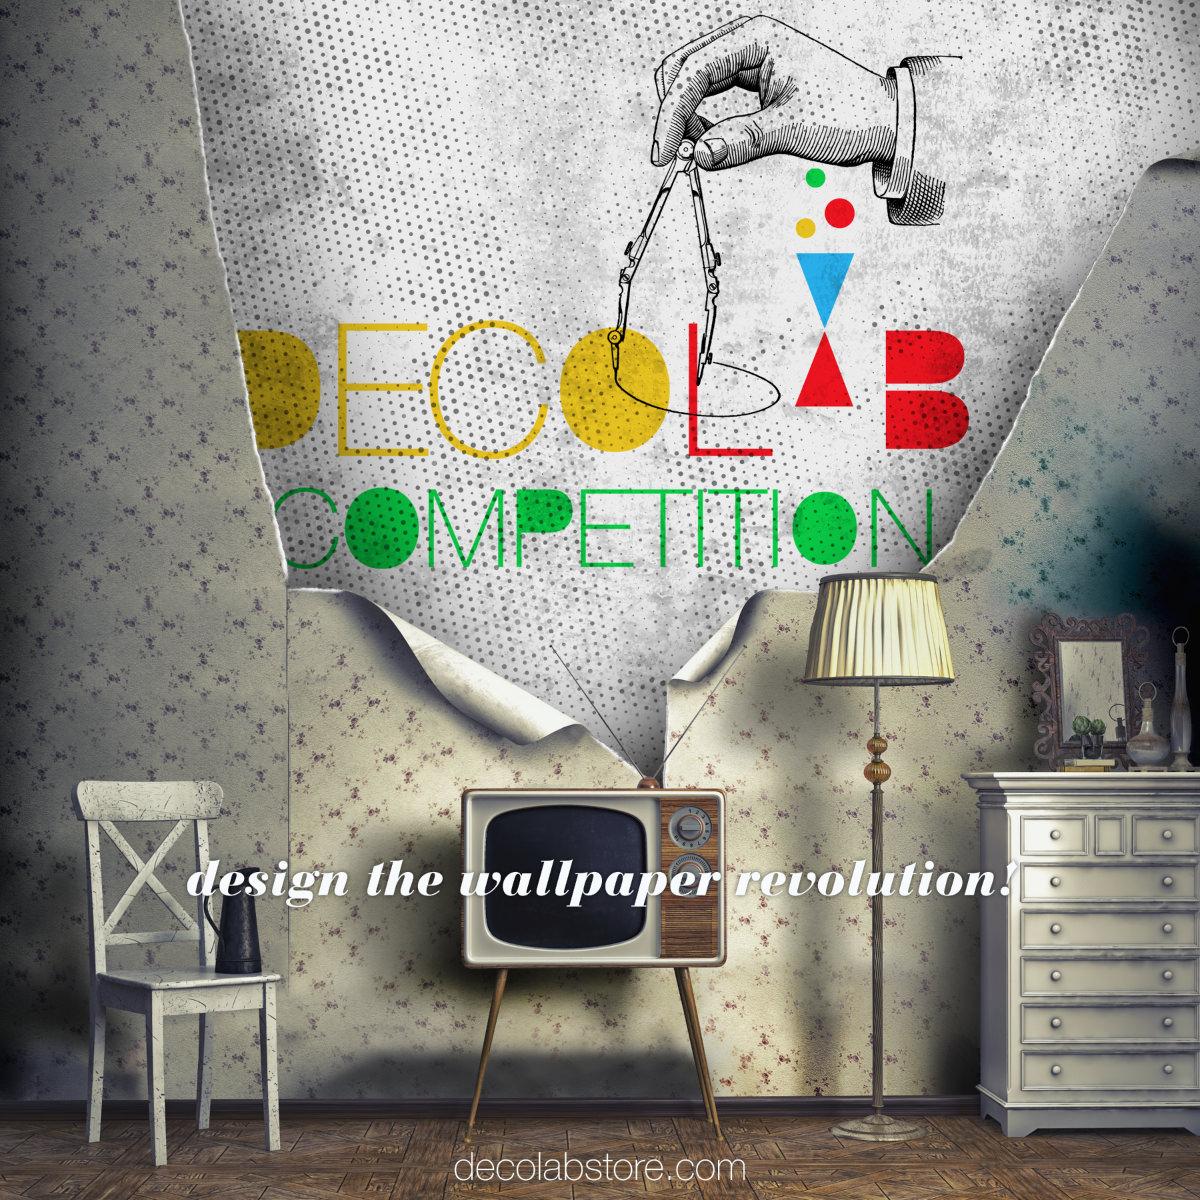 Decolab_image-size-promo_1200x1200